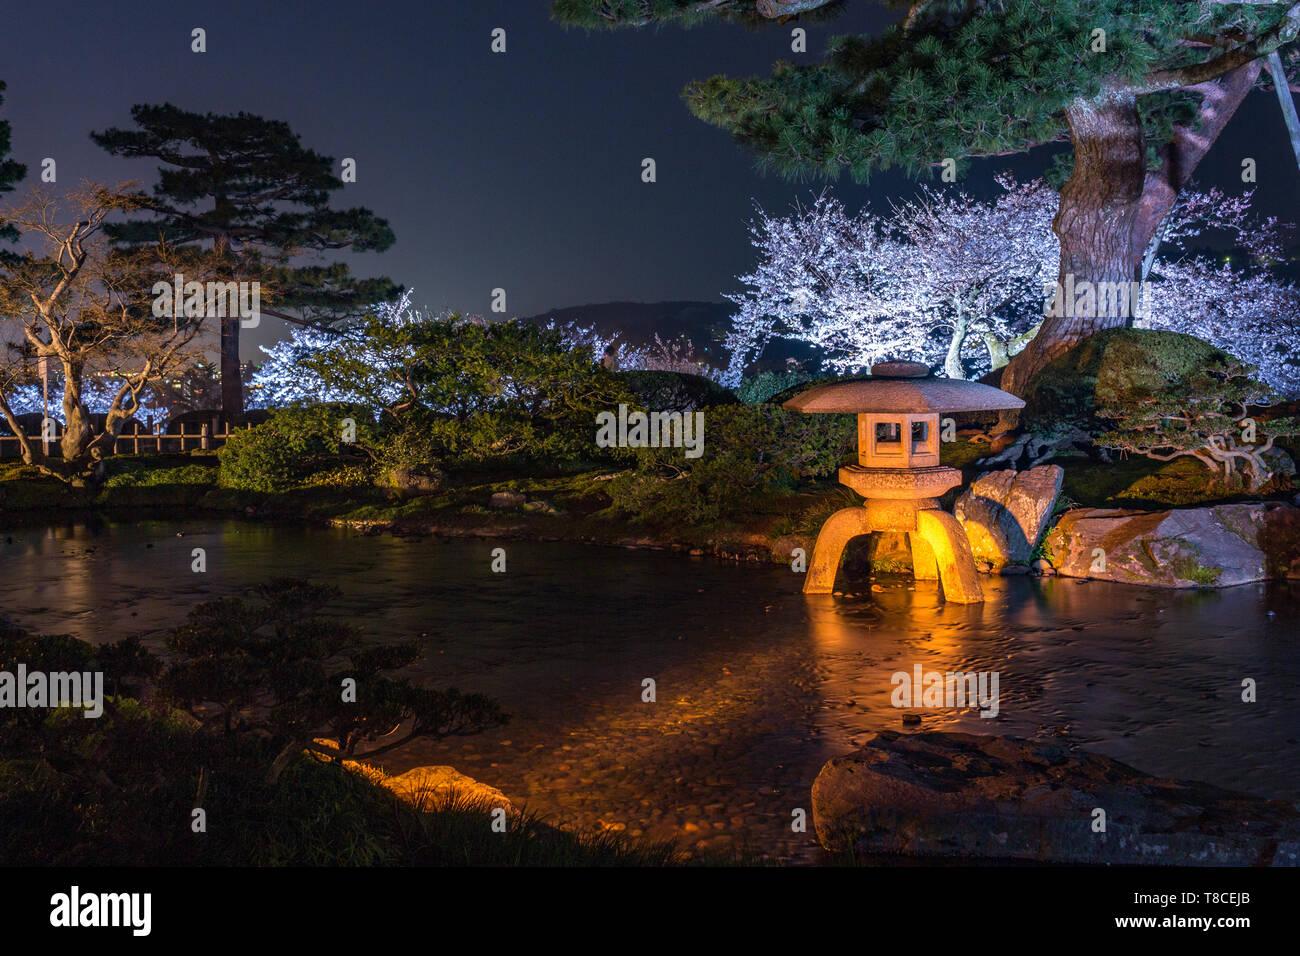 Kenrokuen Gardens By Night With Stone Kotoji Toro Lantern And Trees Reflected In Water Ishikawa Prefecture Western Japan Kenrokuen Is One Of The Stock Photo Alamy